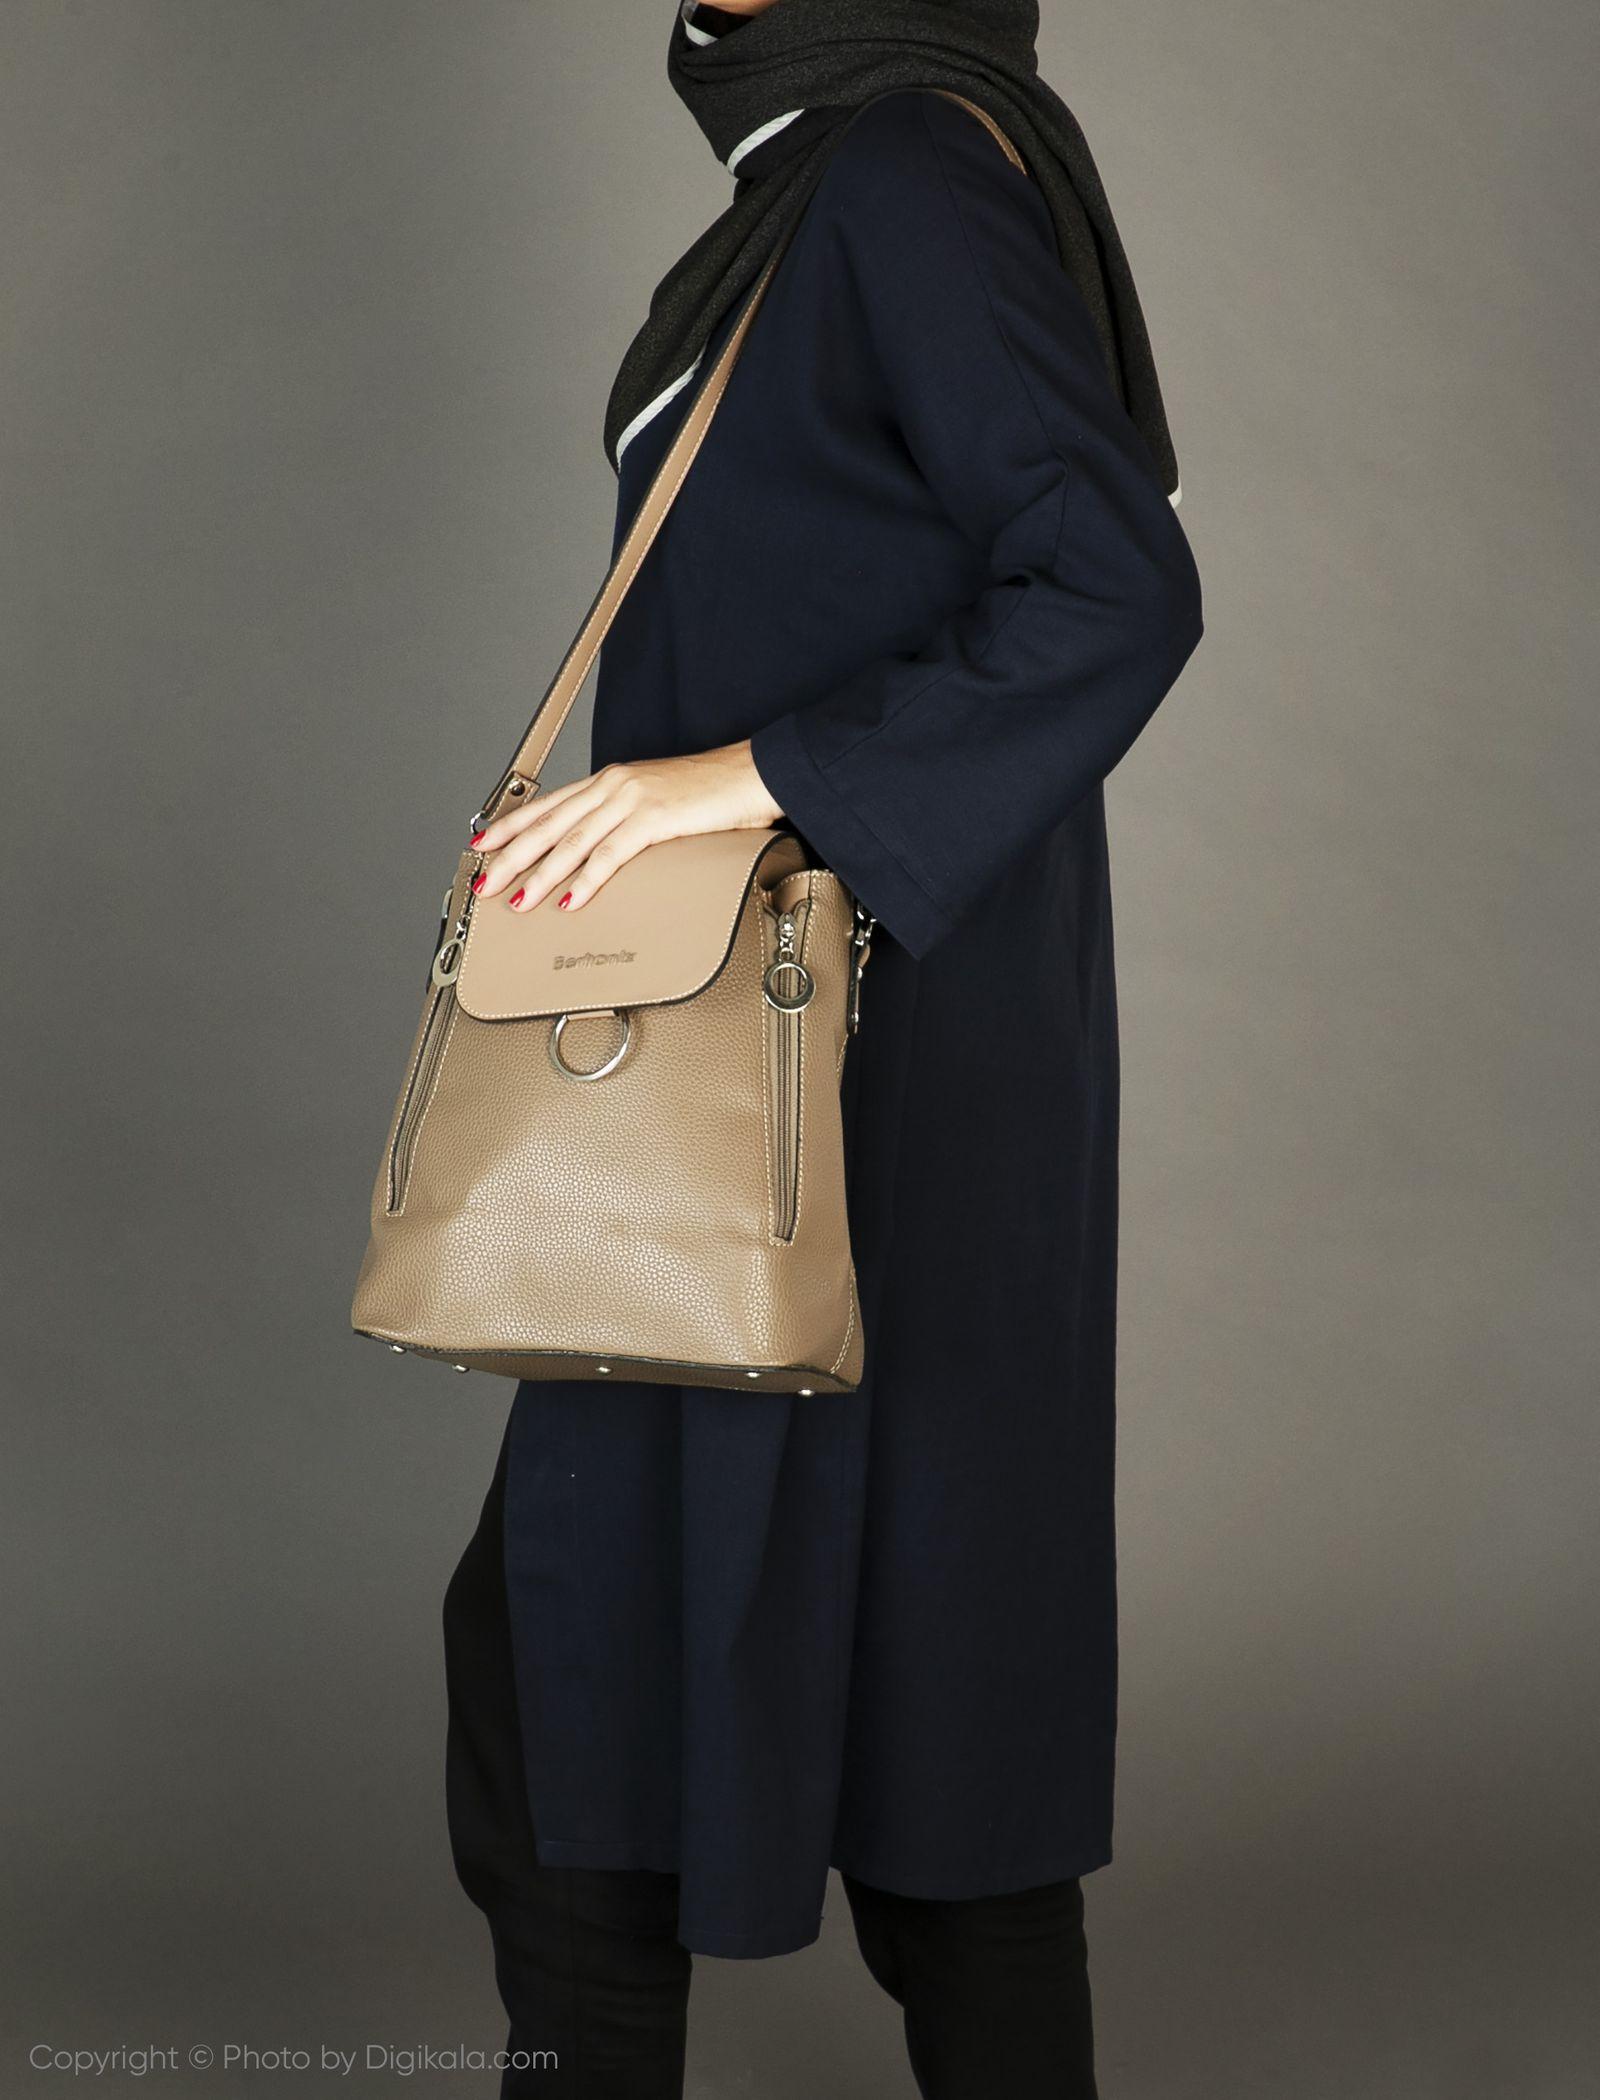 کوله پشتی زنانه برتونیکس مدل B101-30 -  - 5